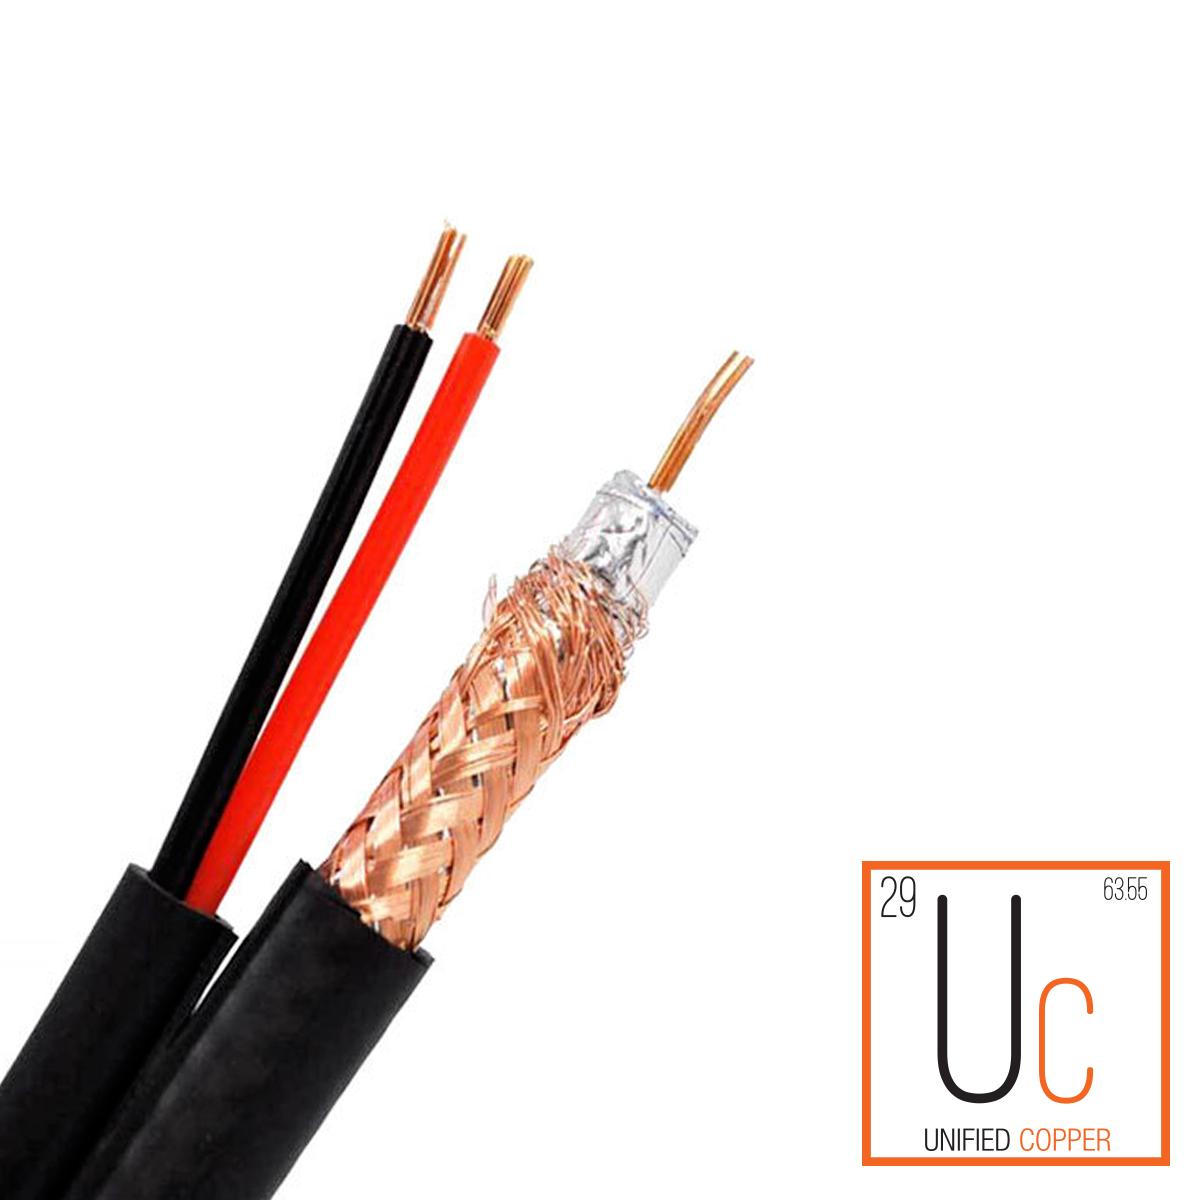 Uc Rgpwbk500 Sm Copper Wiring Devices